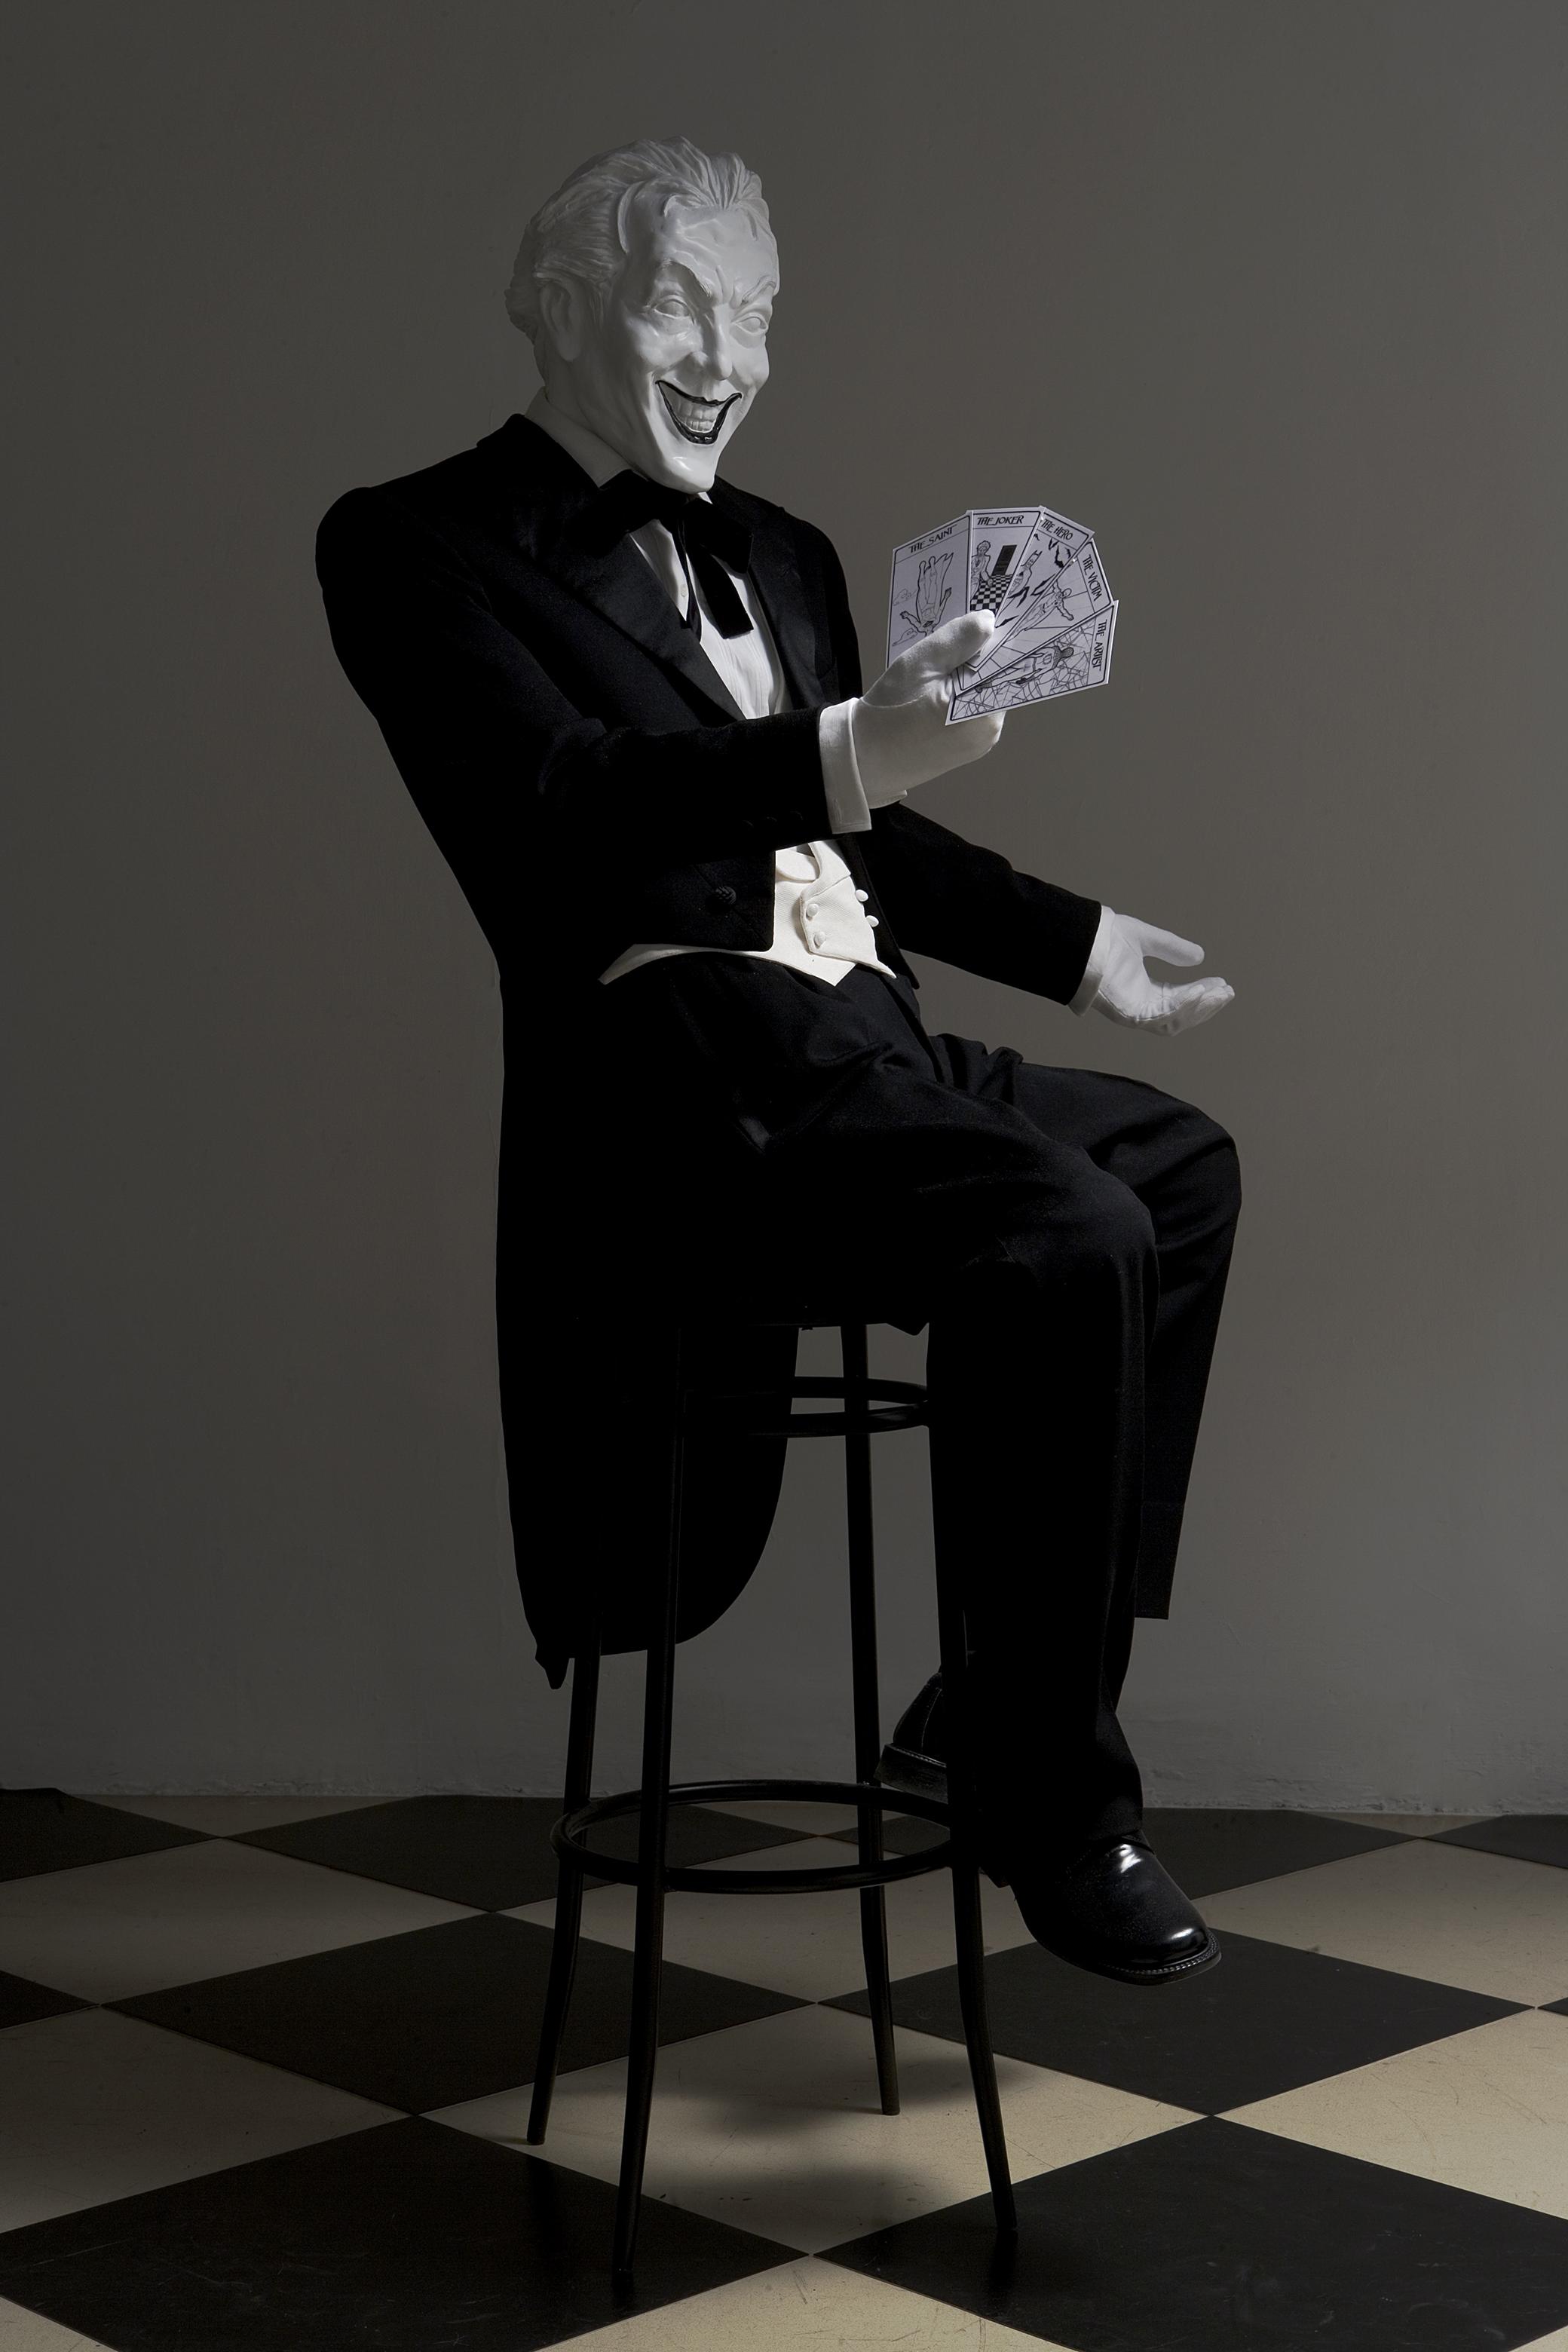 THE KILLING JOKE , 2006 , Fibreglass and mixed media, 160x80x60 cm. Photo: Claudio Abate